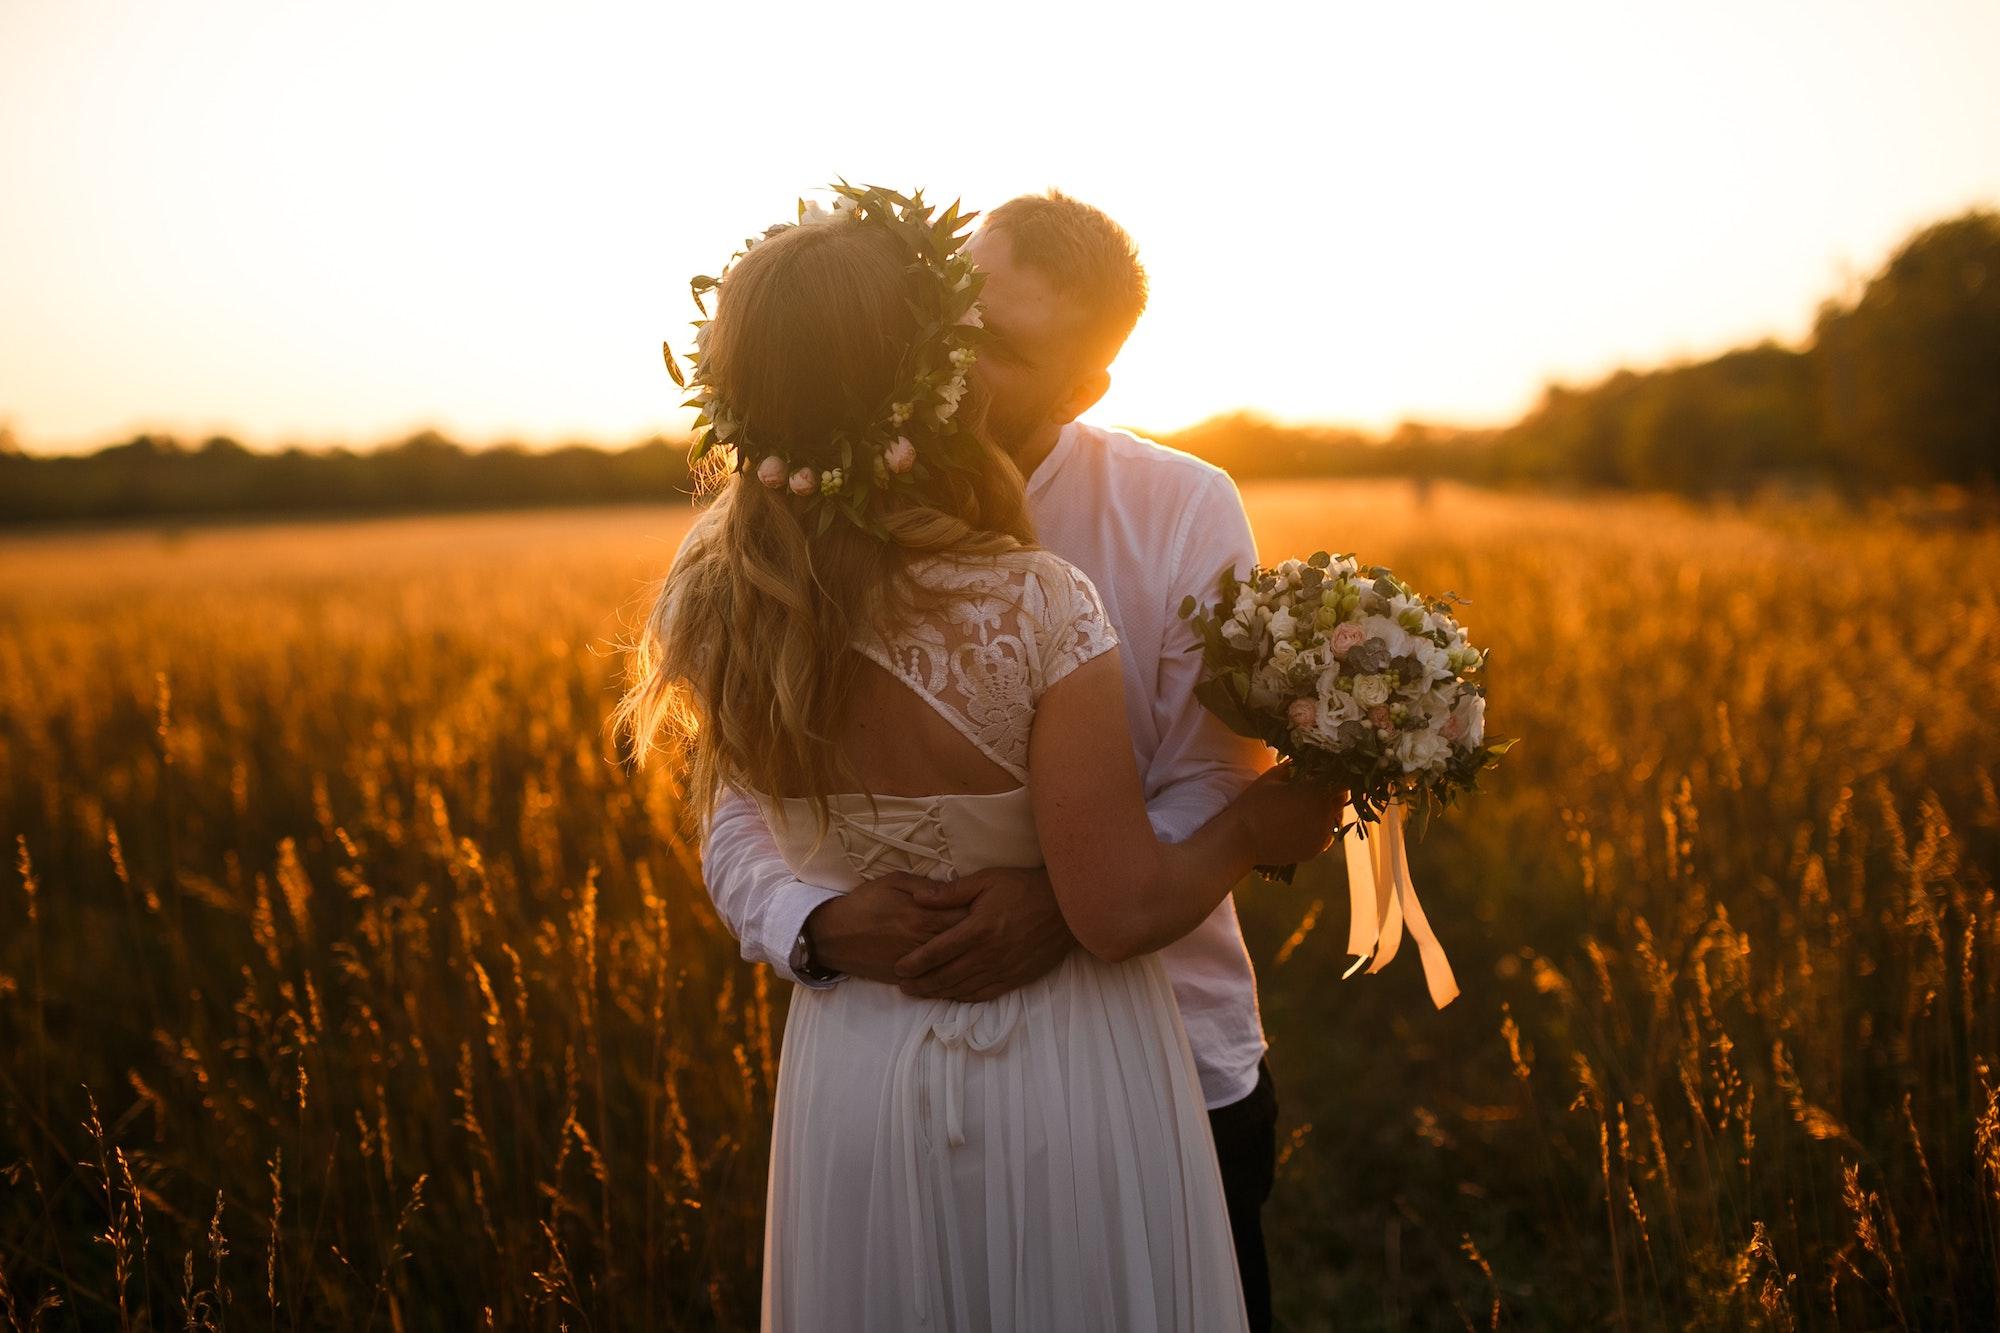 How to have the best woodland wedding | Wedding tips | Elle Blonde Luxury Lifestyle Destination Blog